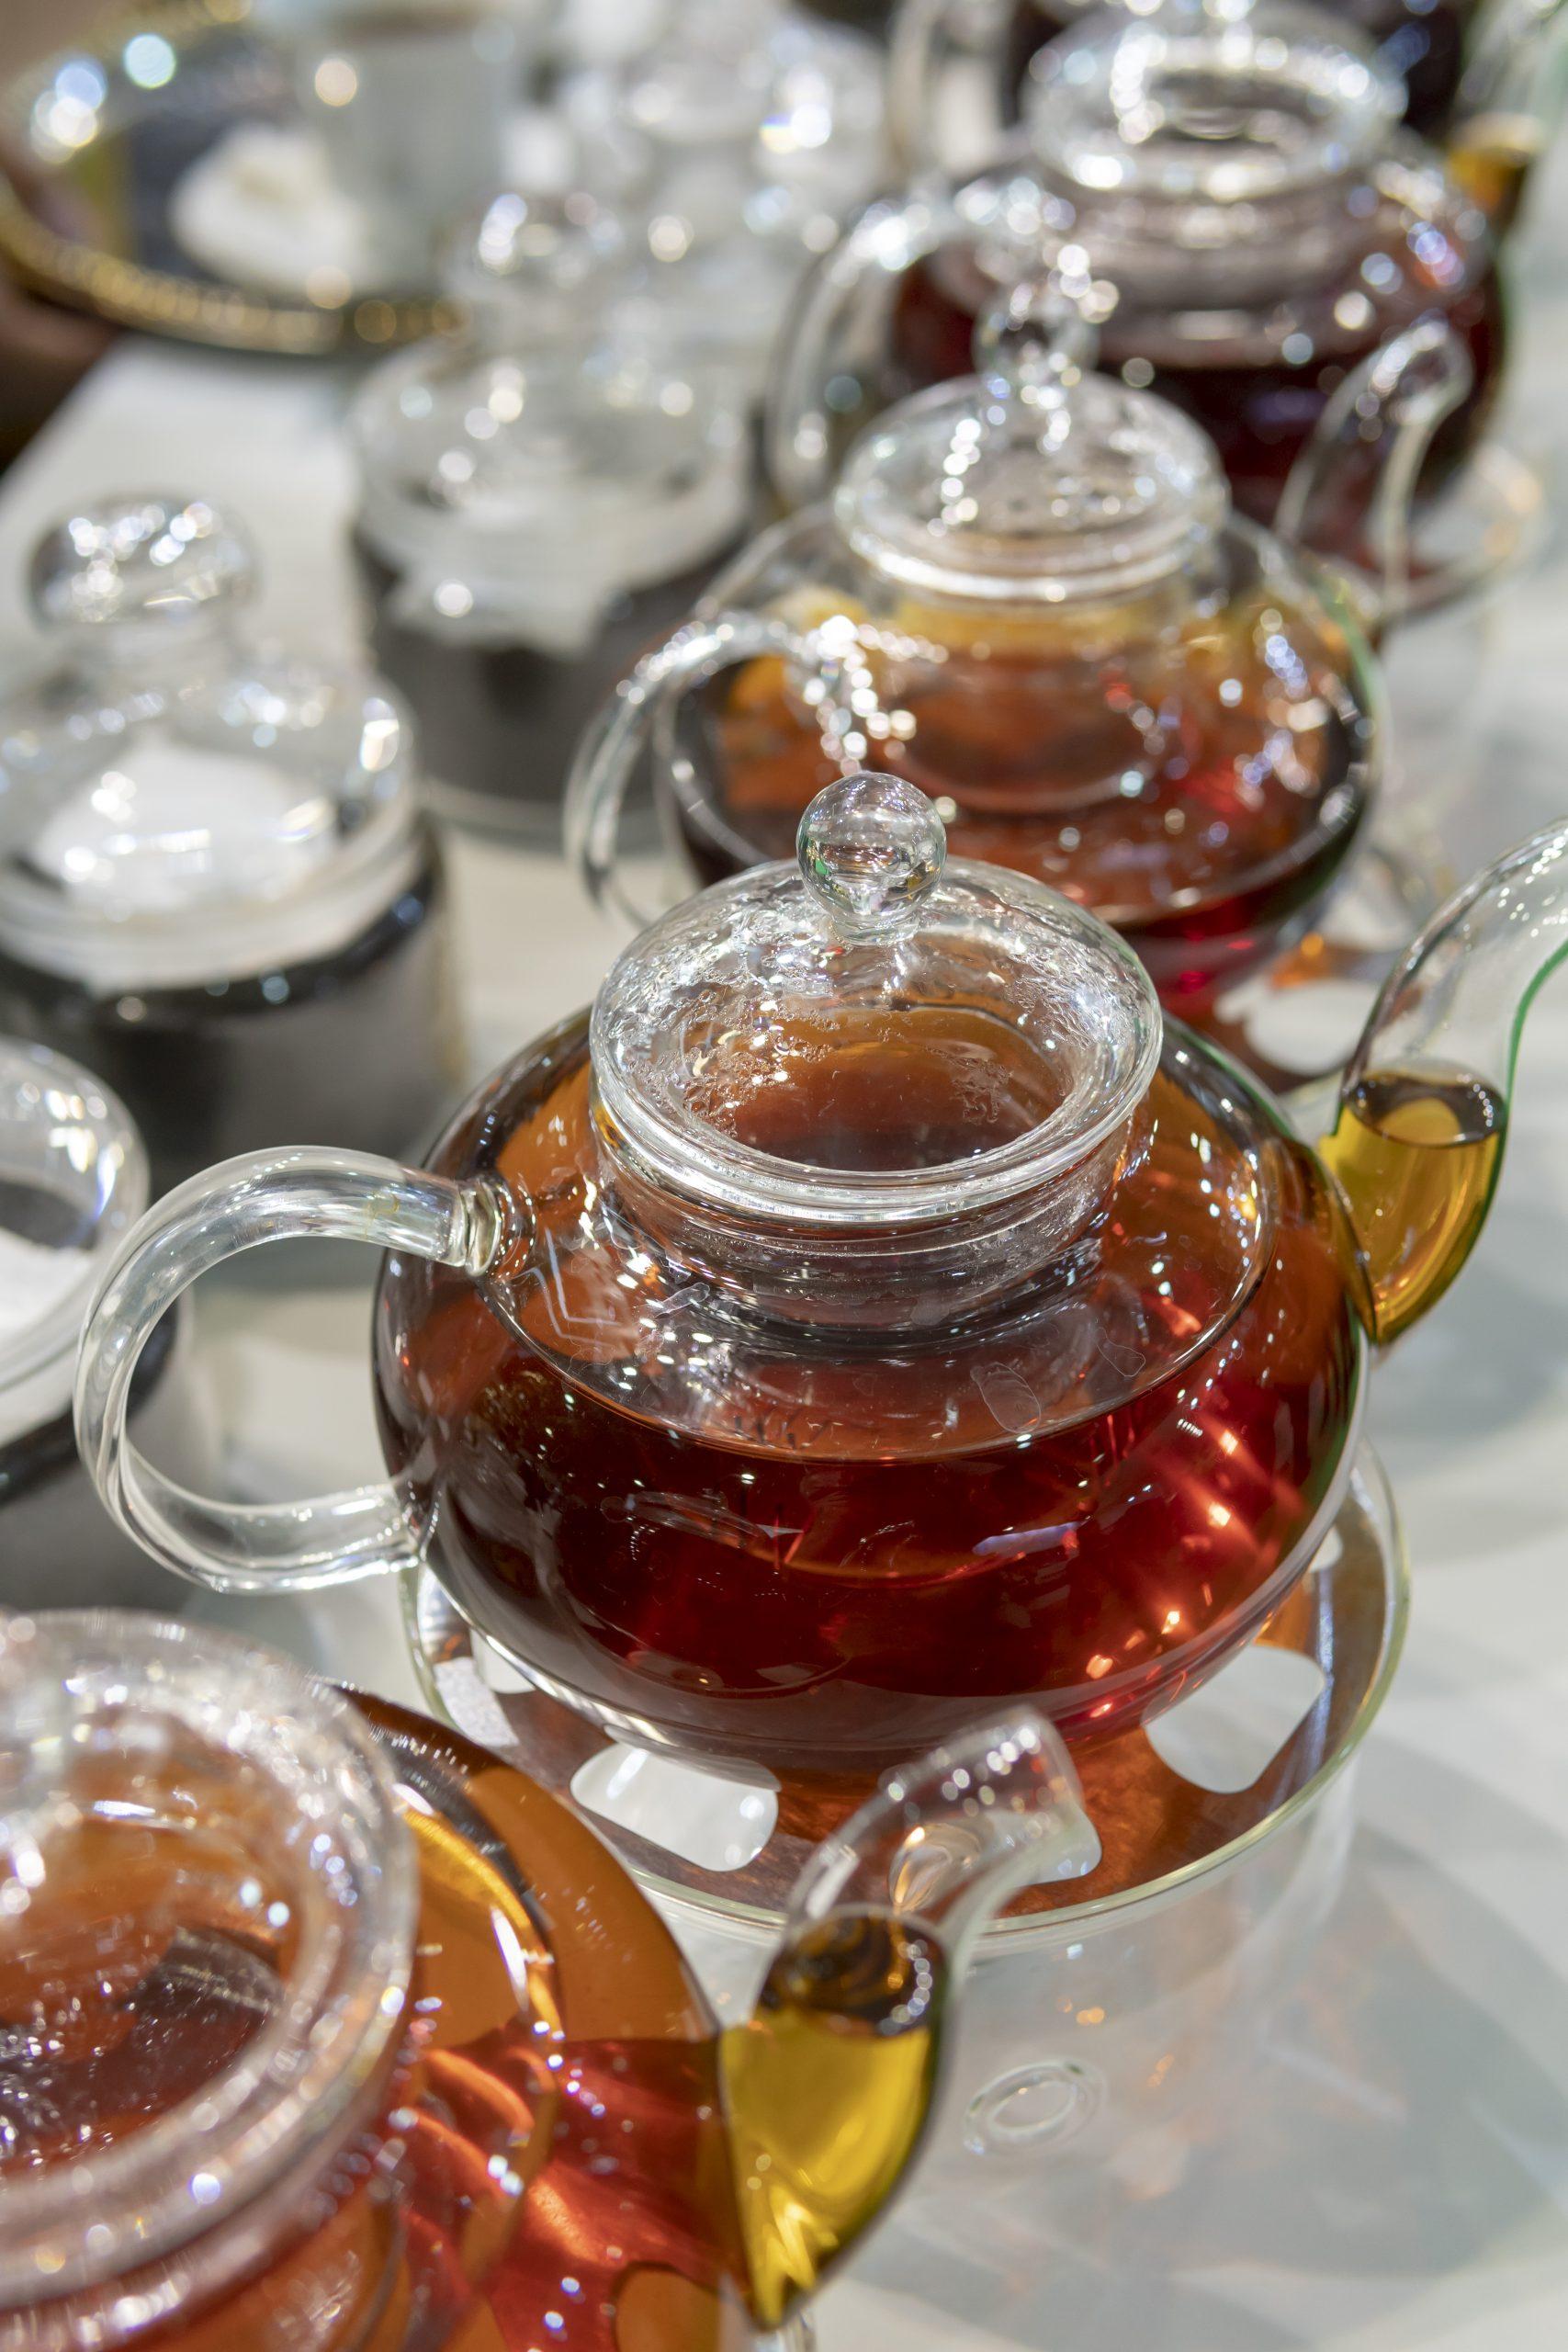 Tea in a glass transparent teapot.